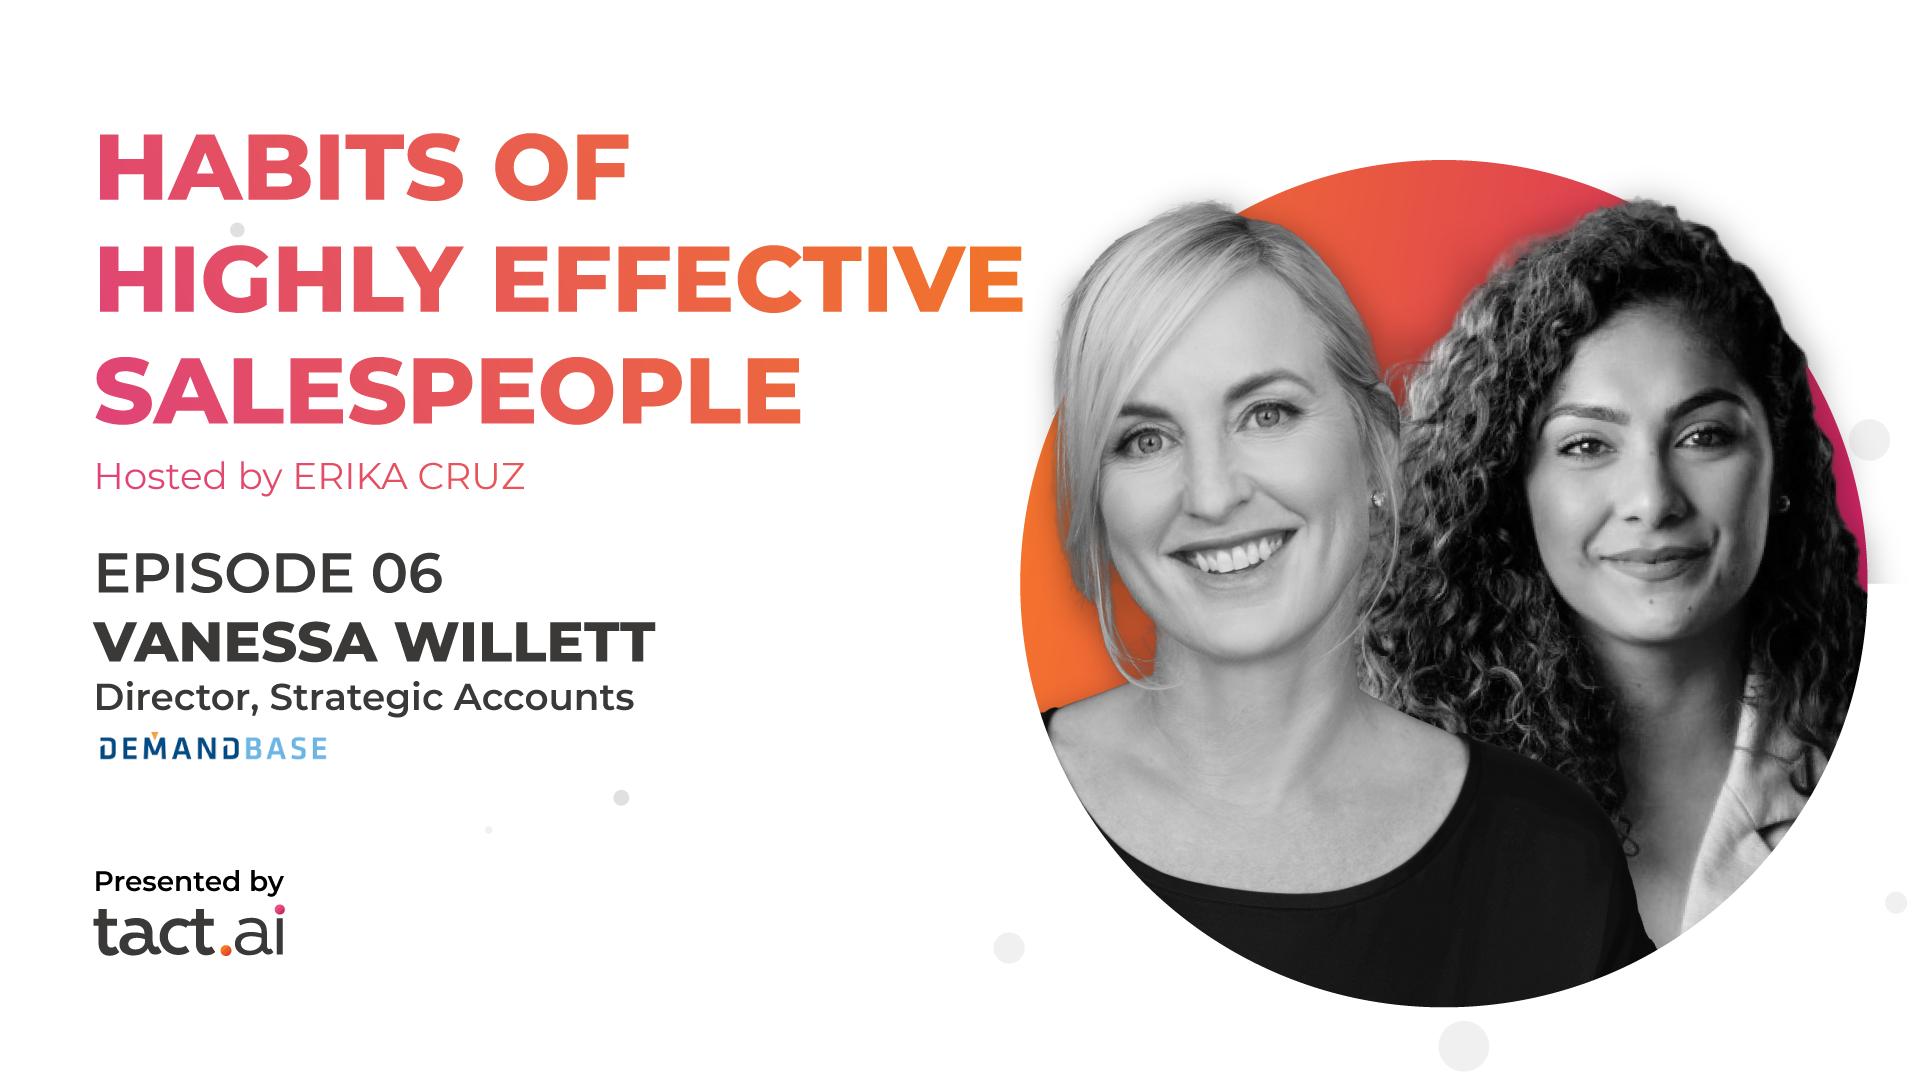 Habits of Highly Effective Salespeople - Vanessa Willet - Episode 6